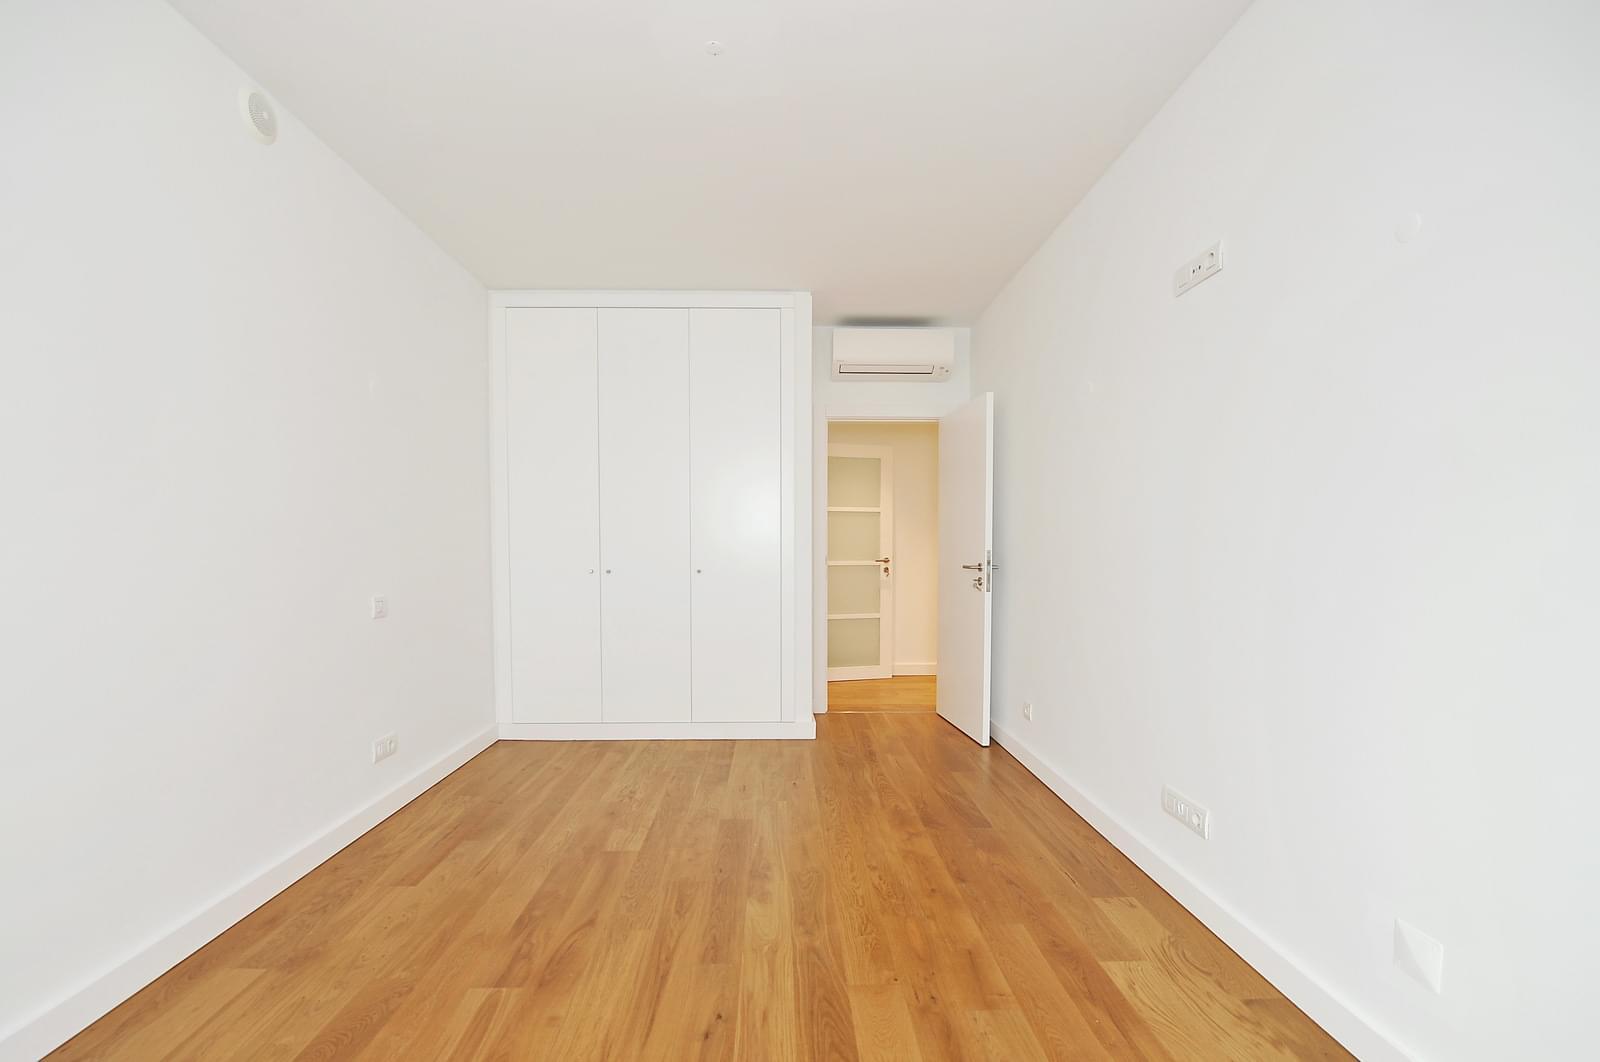 PF18653, Appartement T3, OEIRAS